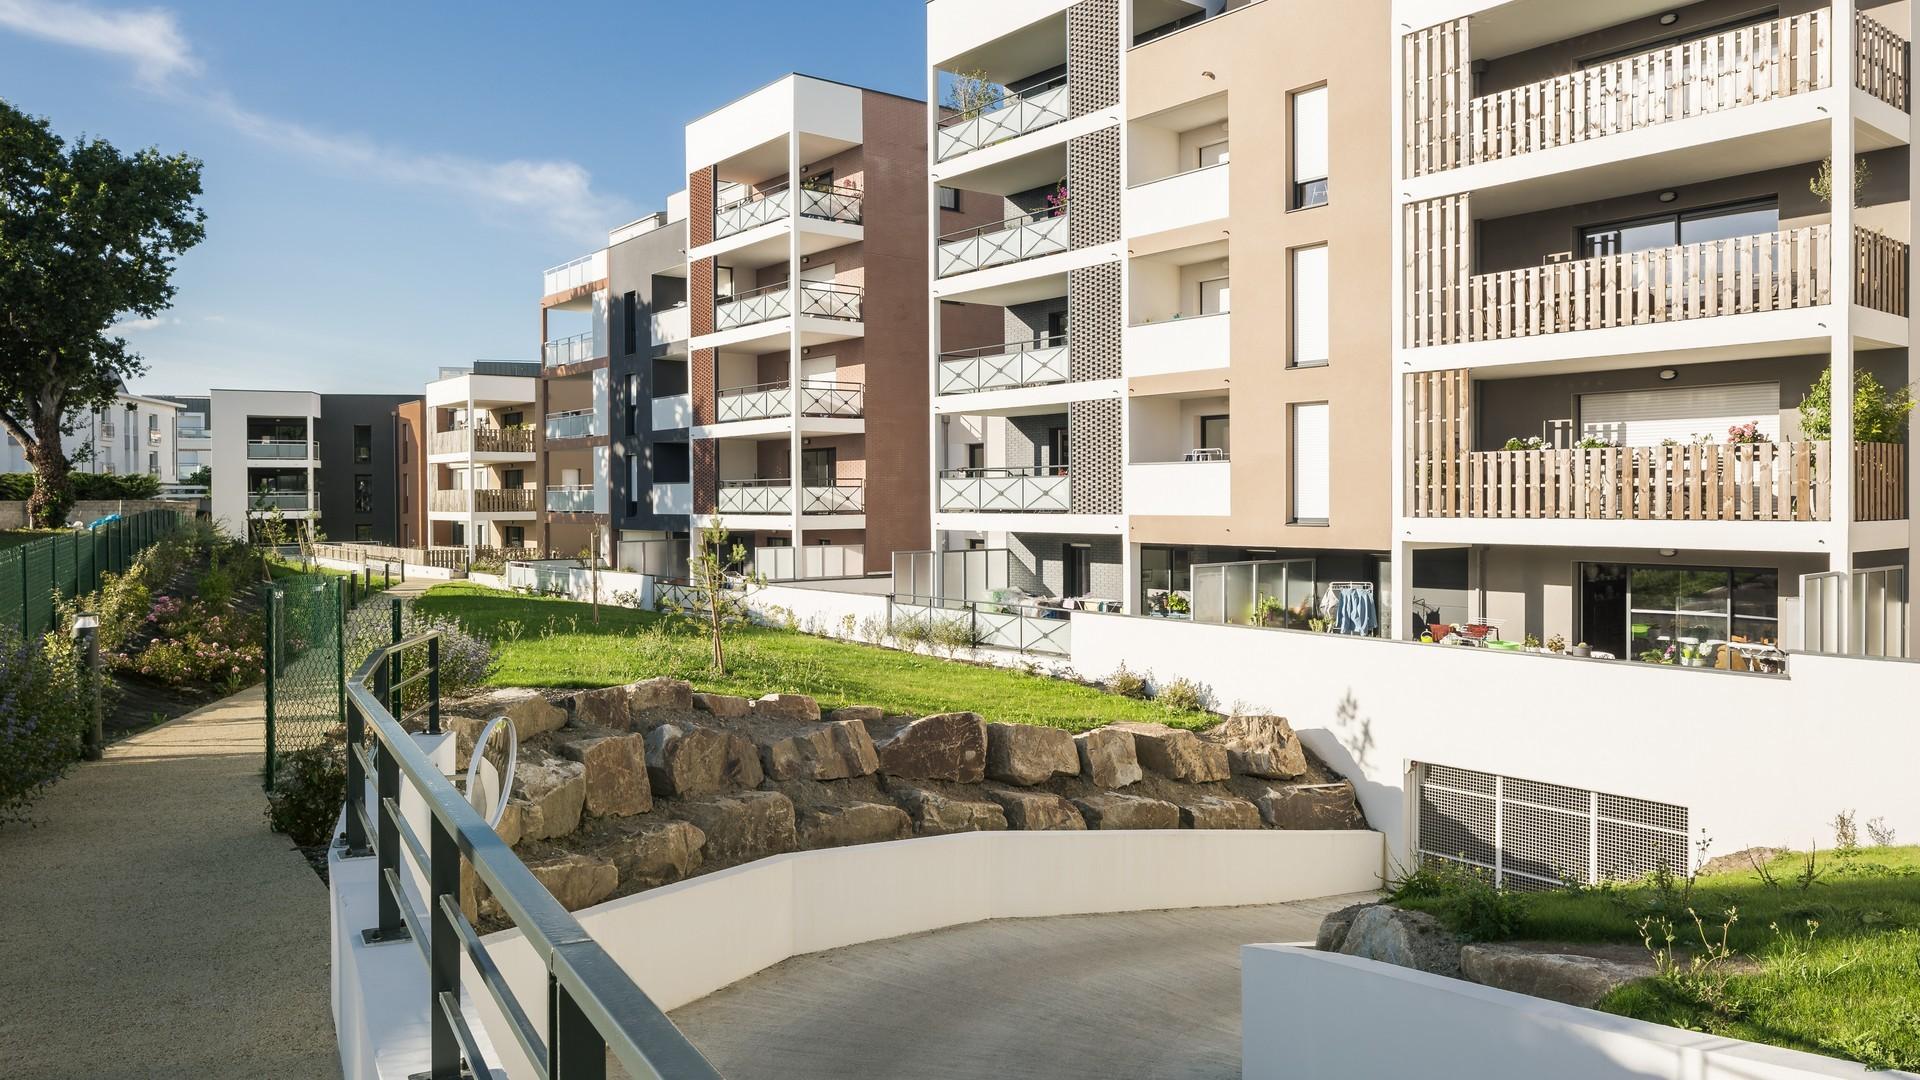 51 logements quai amp re dinard r alisations cnr construction. Black Bedroom Furniture Sets. Home Design Ideas